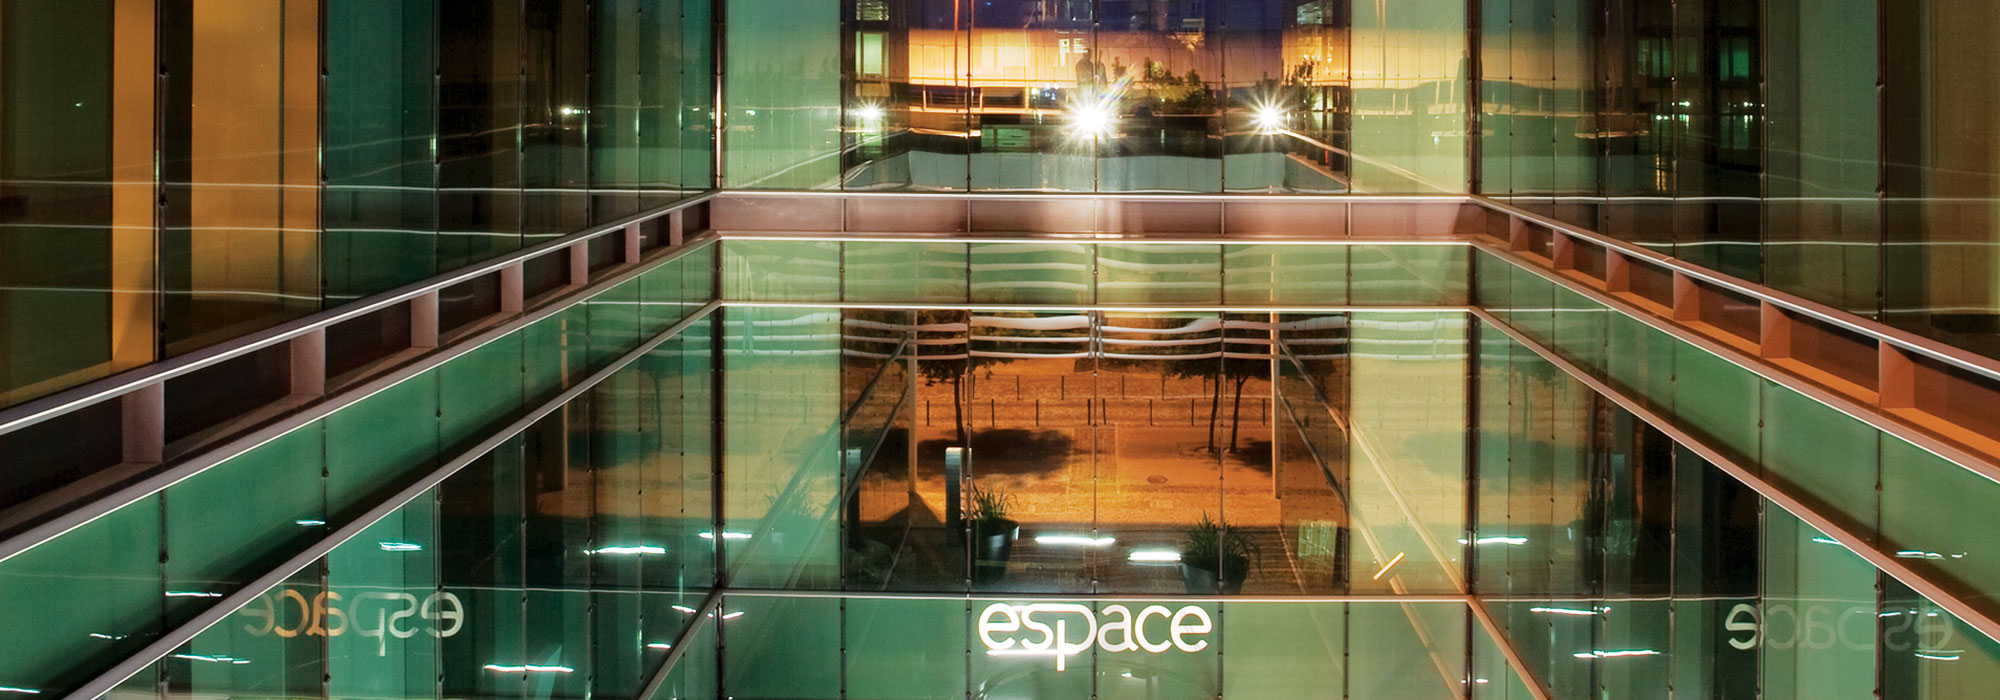 Espace & Explorer